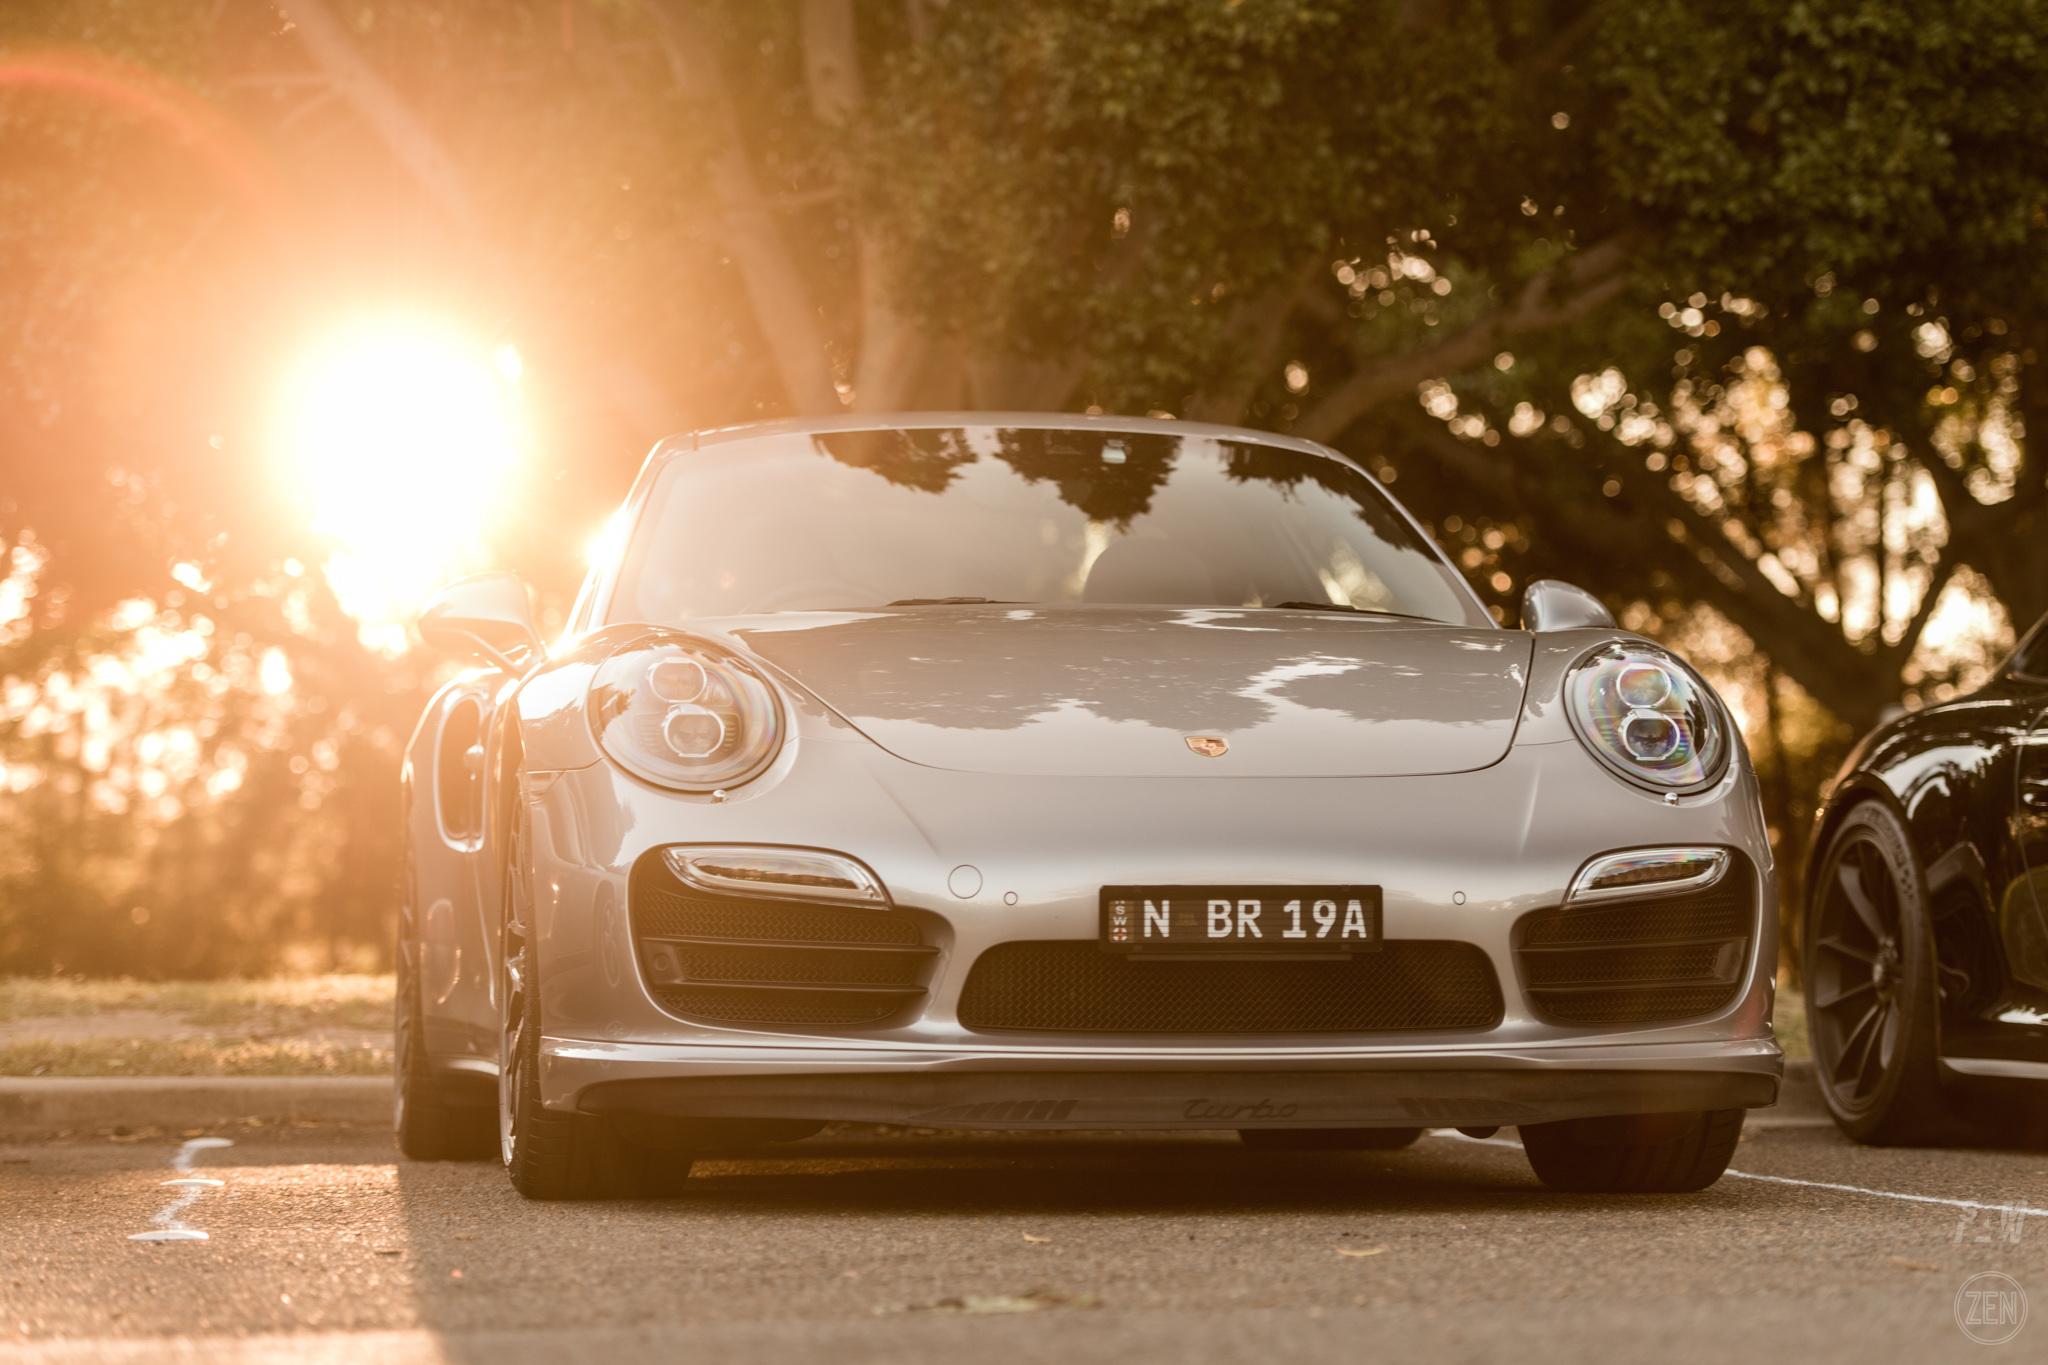 2019-10-27 - Autohaus Porsches & Coffee 019